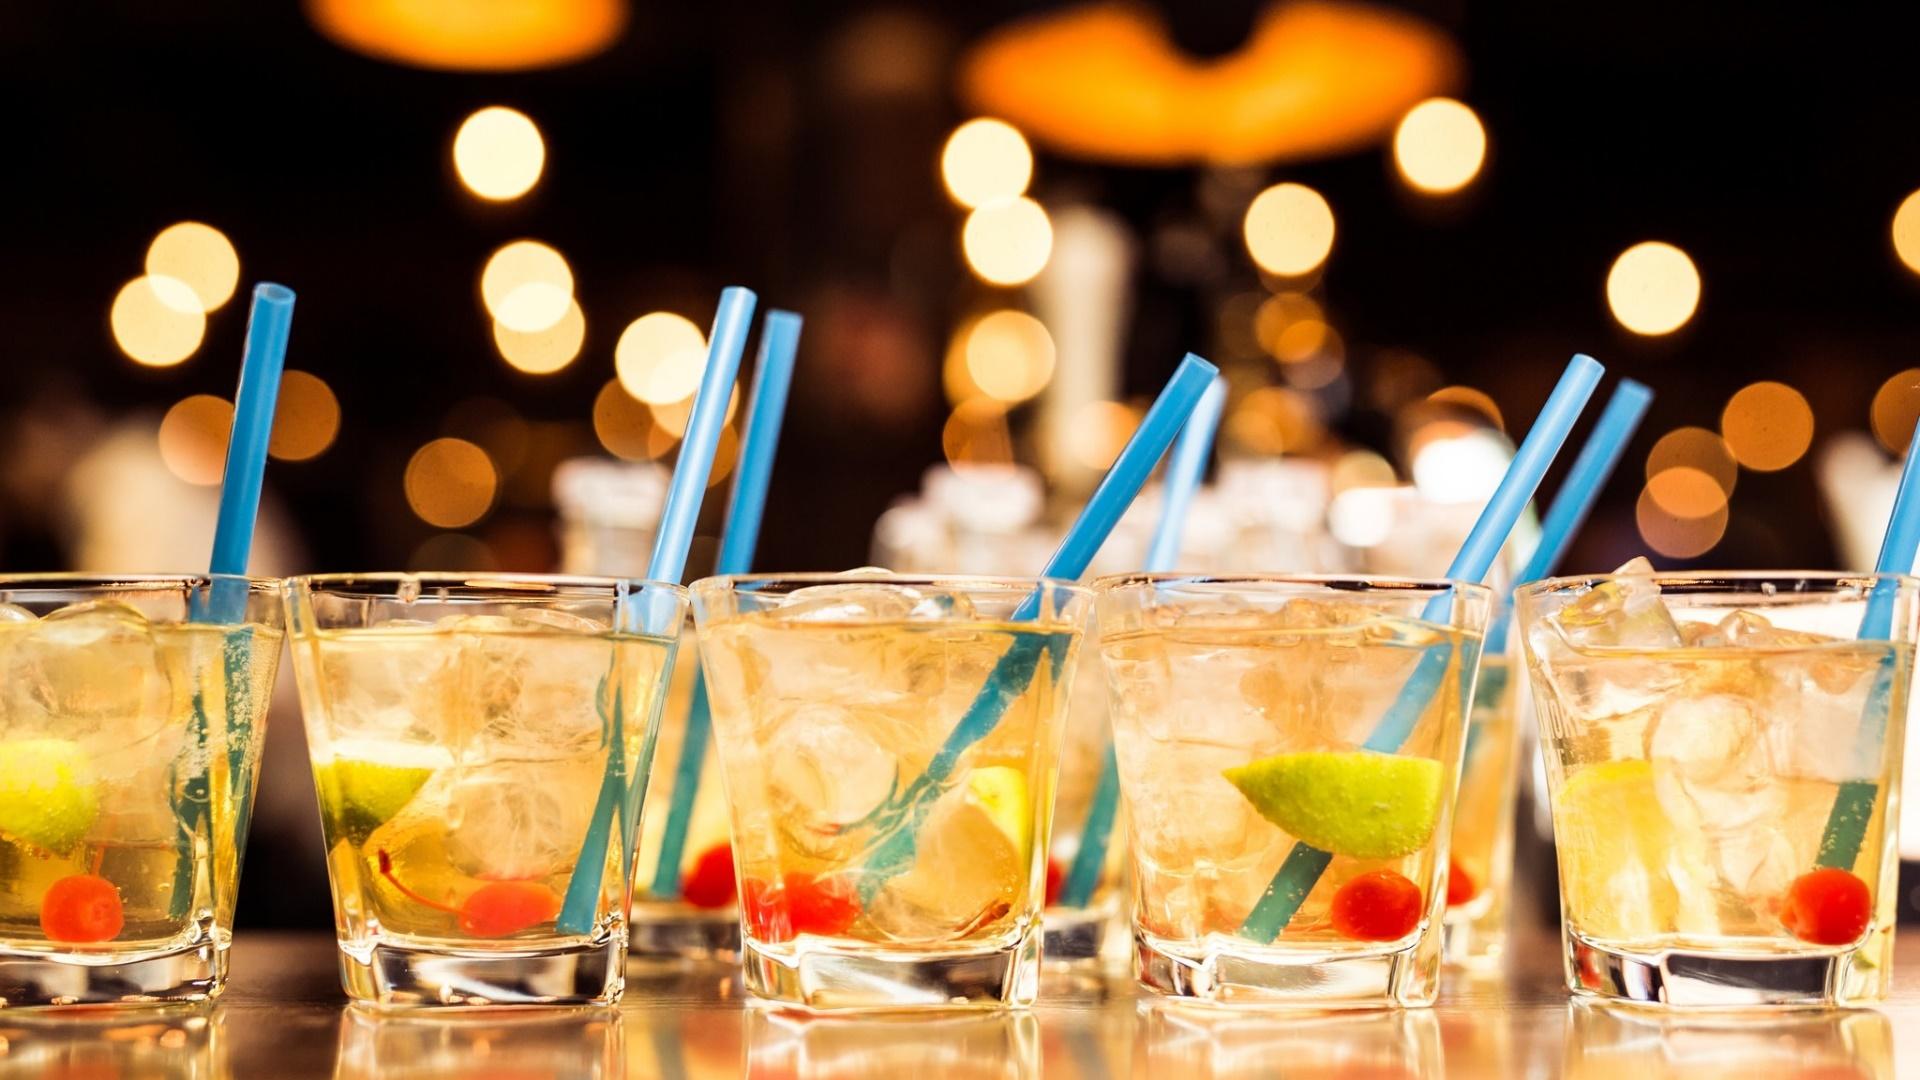 Картинки коктейлей в бокале